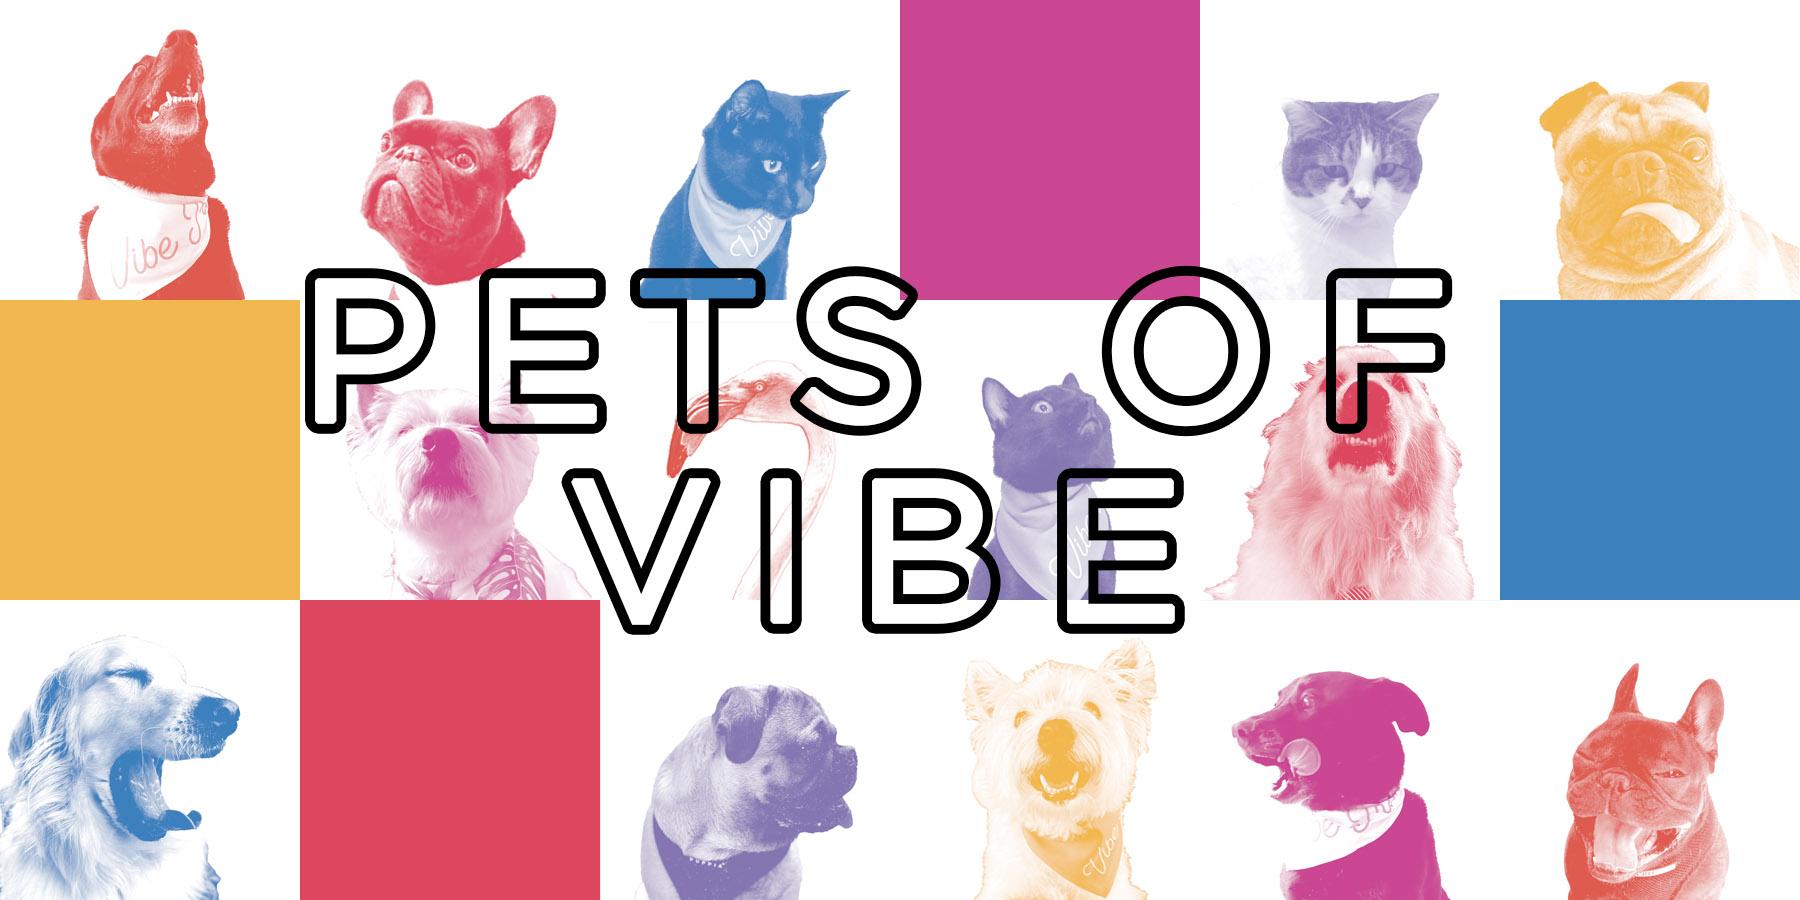 Pets of Vibe